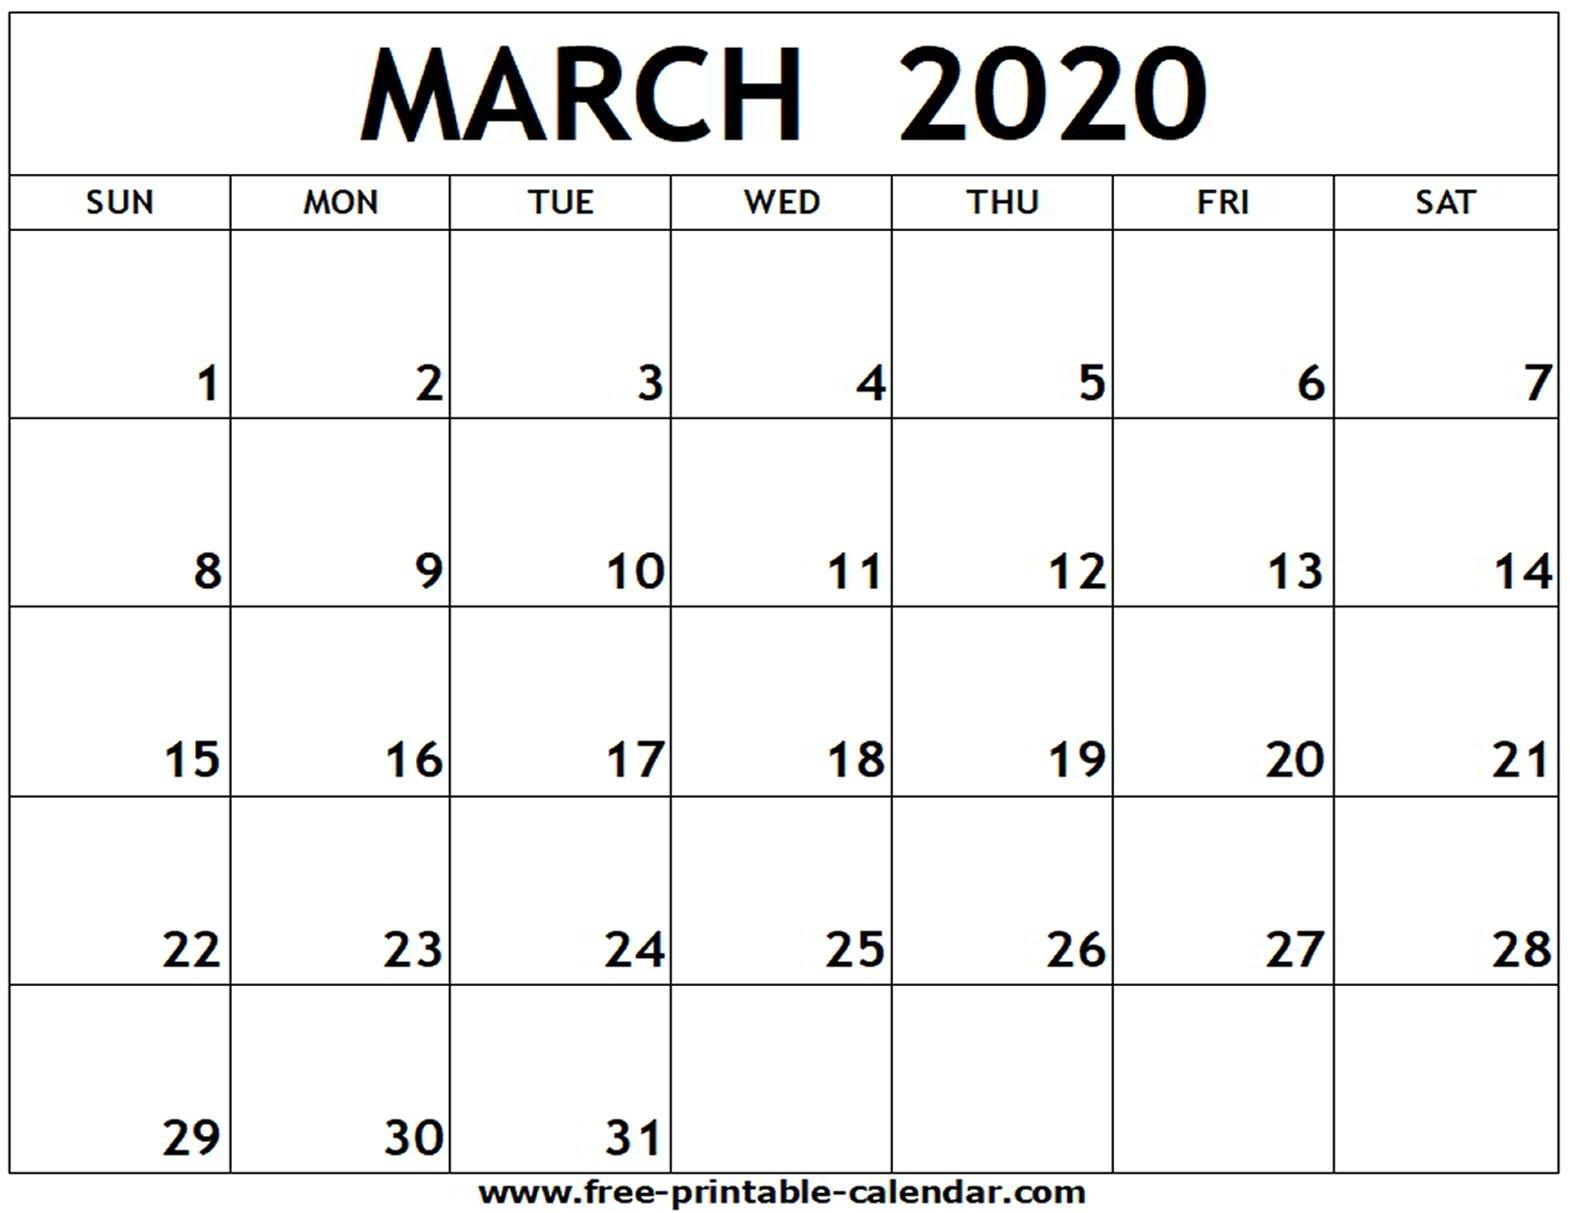 March 2020 Printable Calendar - Free-Printable-Calendar  Blank Calendar 2020 Printable Monthly